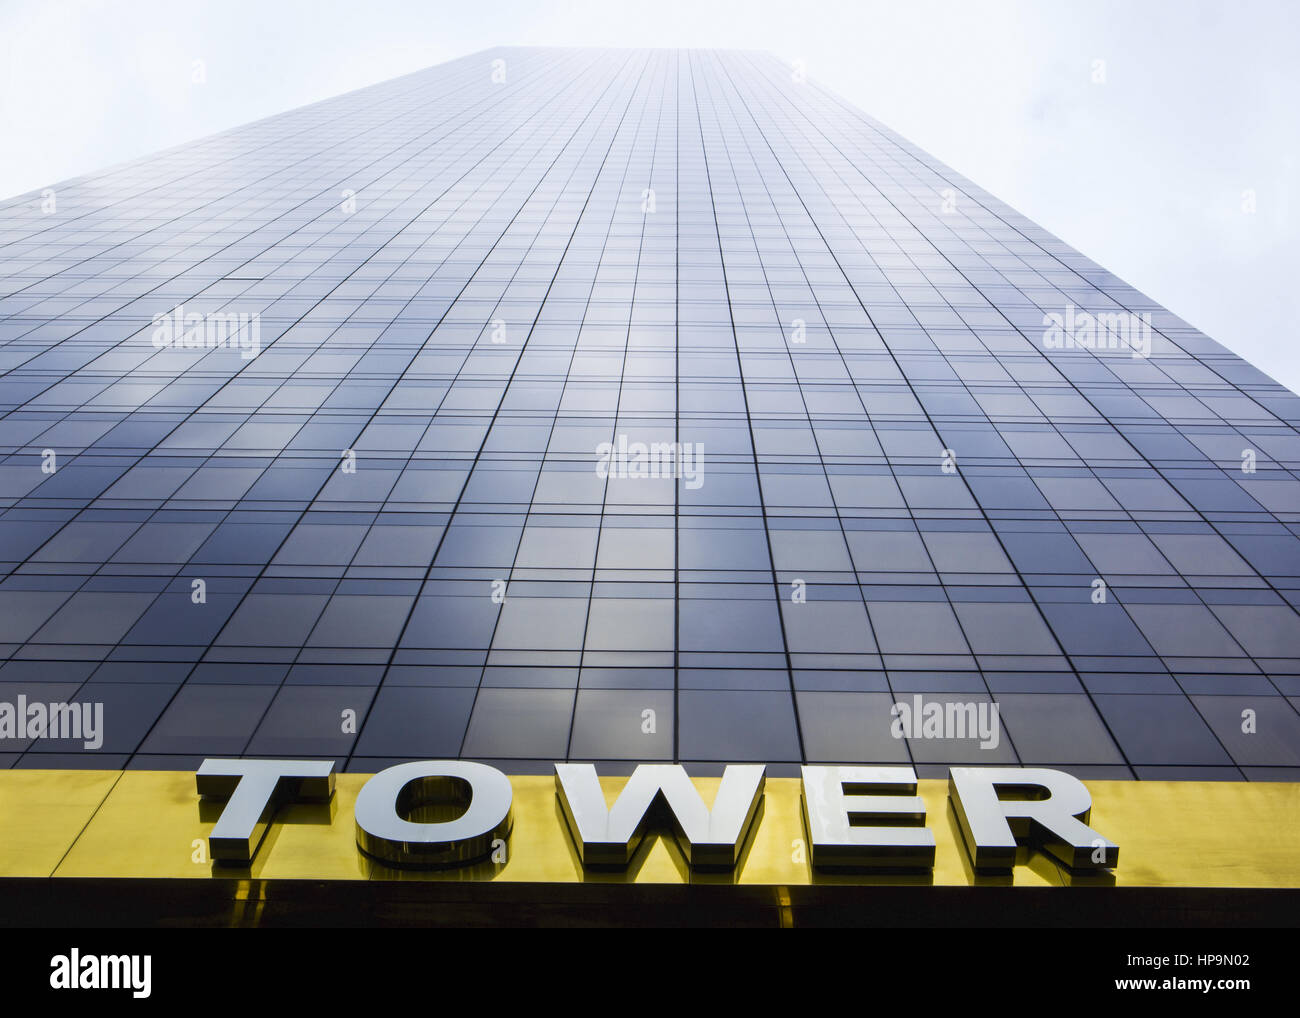 Wolkenkratzer, Trump Tower, New York, USA Stock Photo